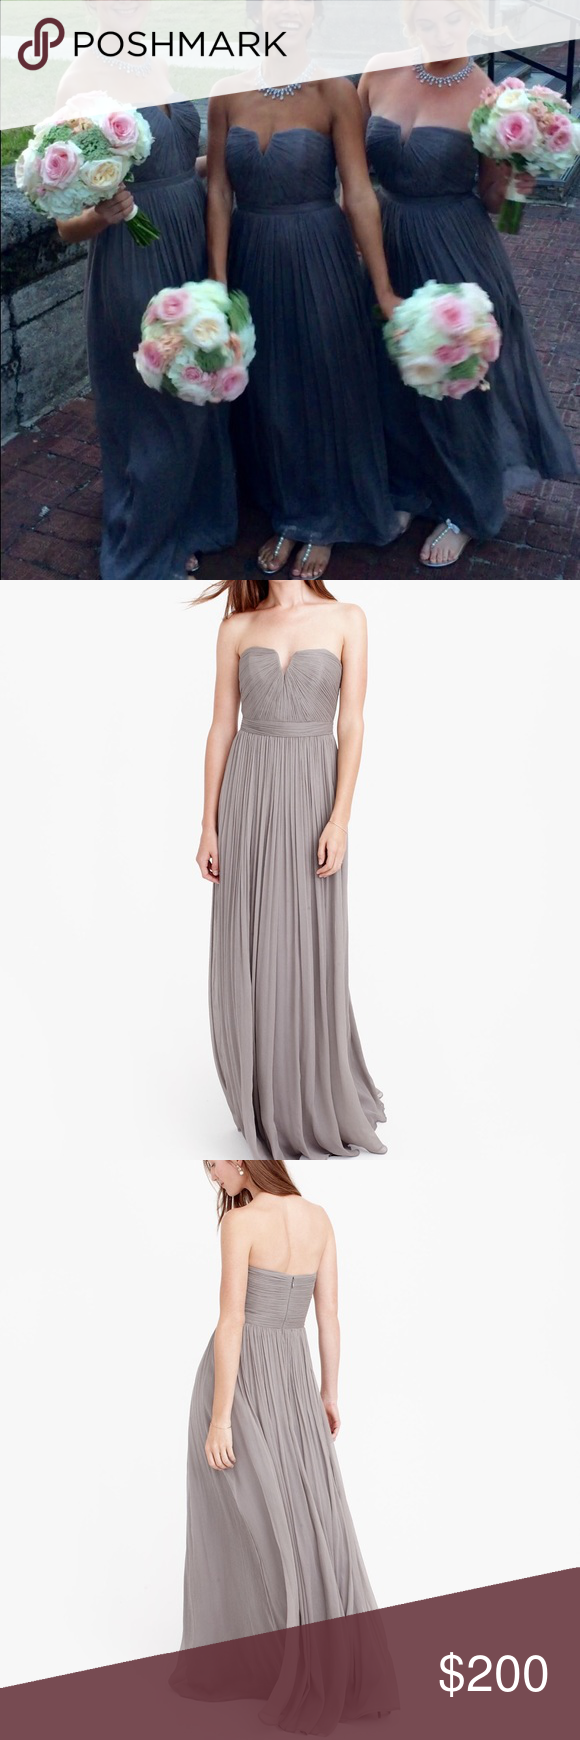 HP💕 J. Crew Nadia satin chiffon bridesmaids dress